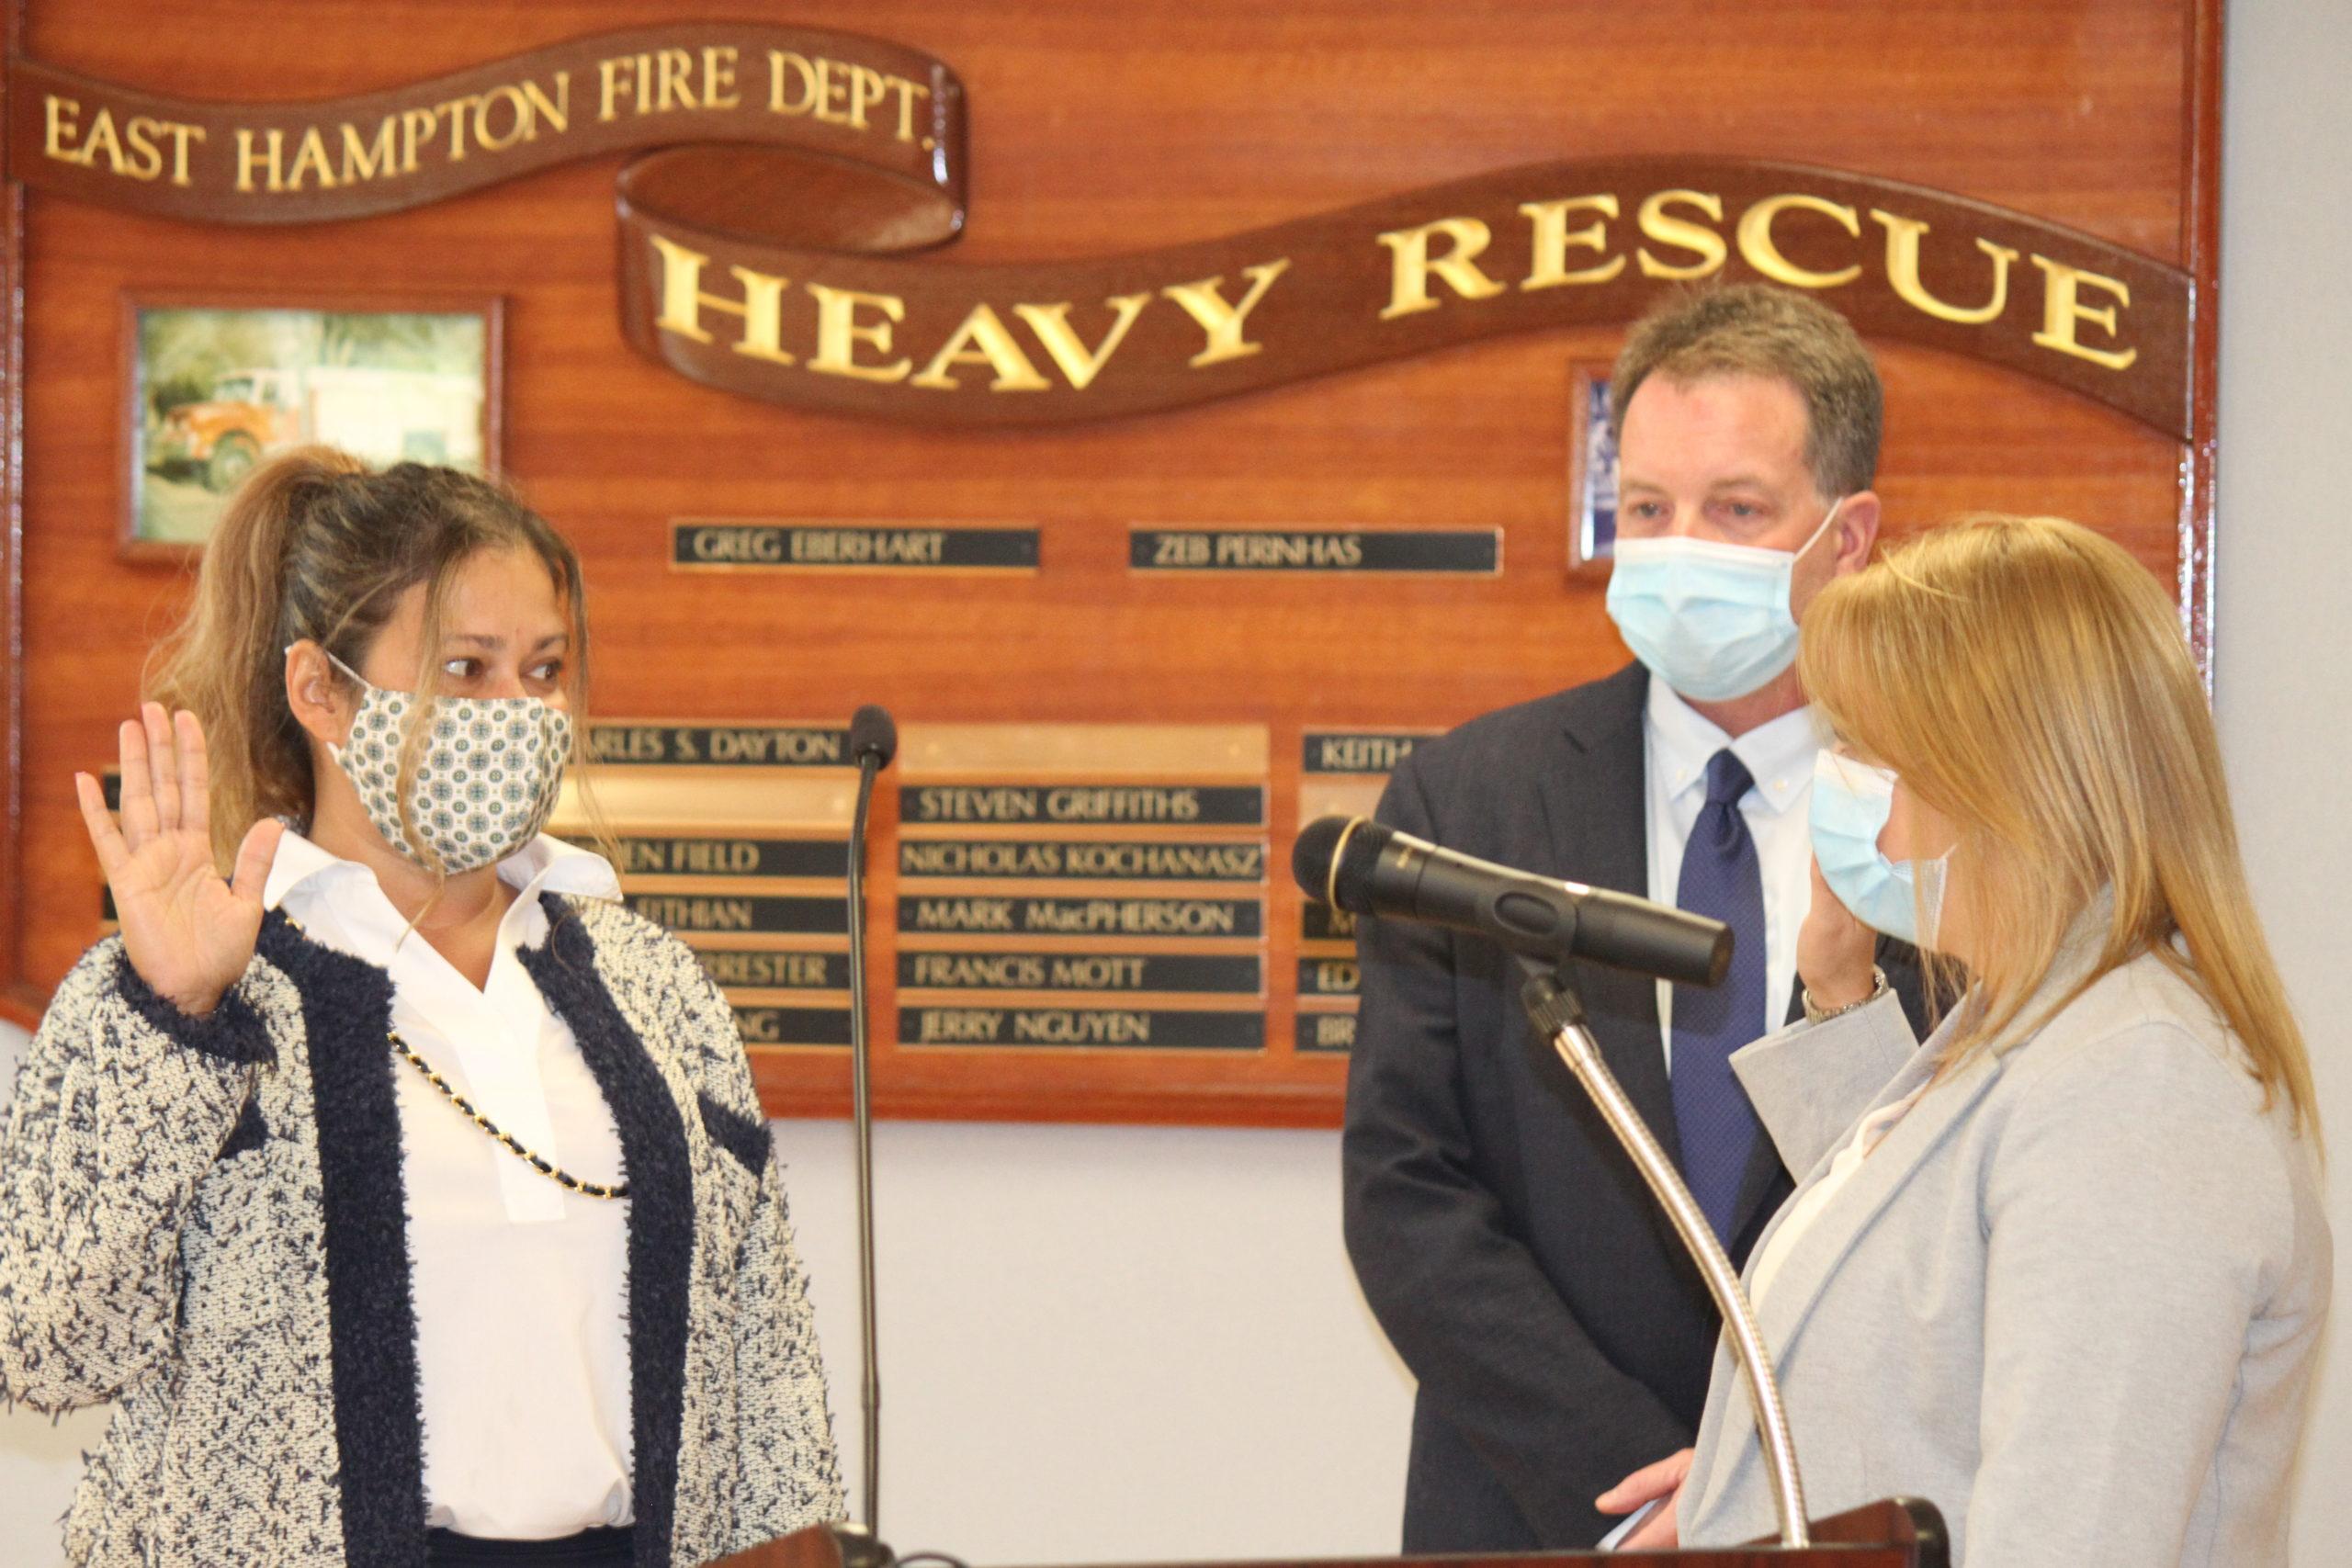 Sandra Melendez is sworn in as an East Hampton Village trustee on Friday.